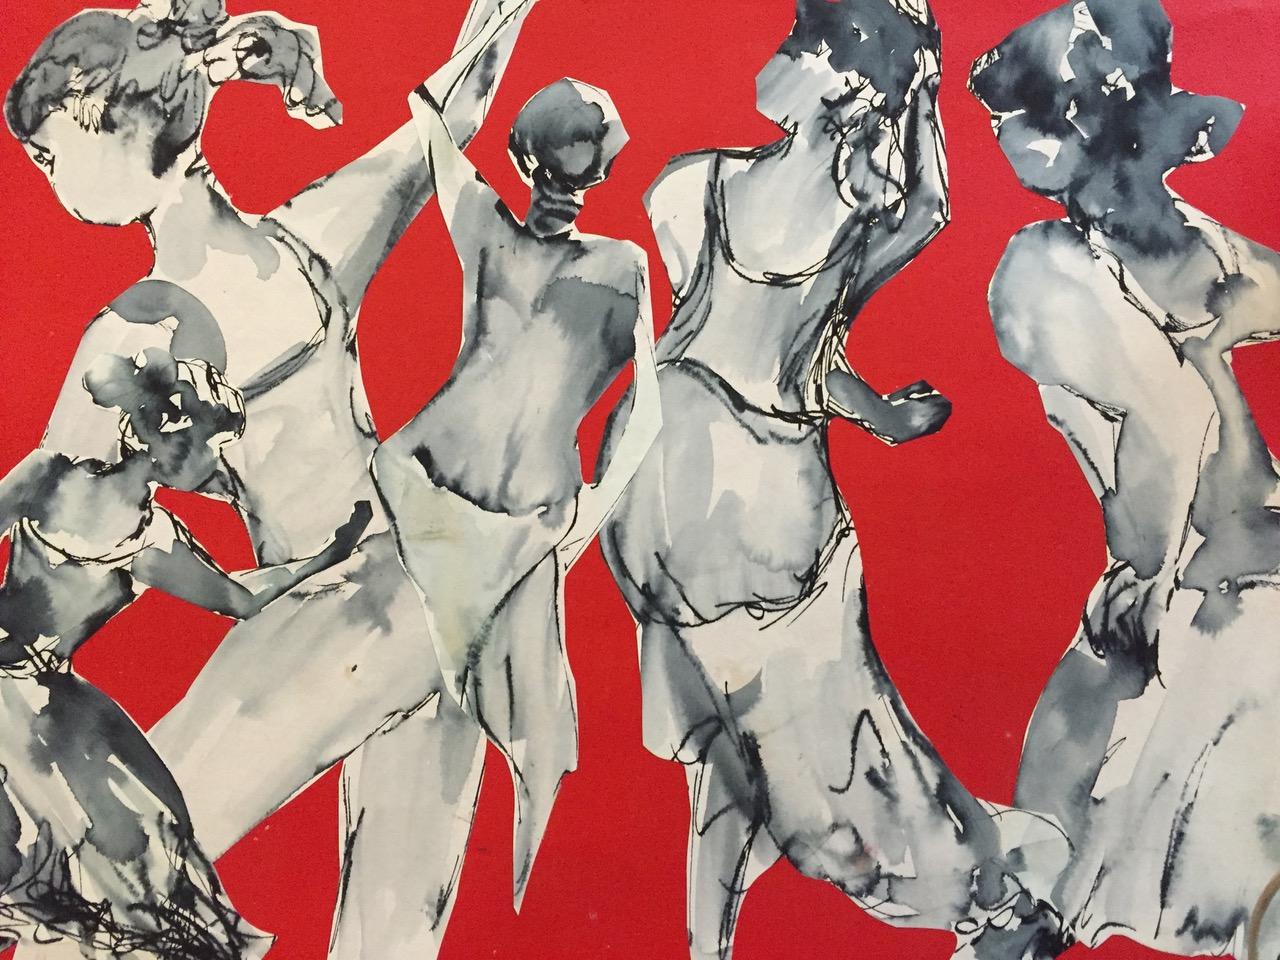 Life Drawing: Flamenco Style!